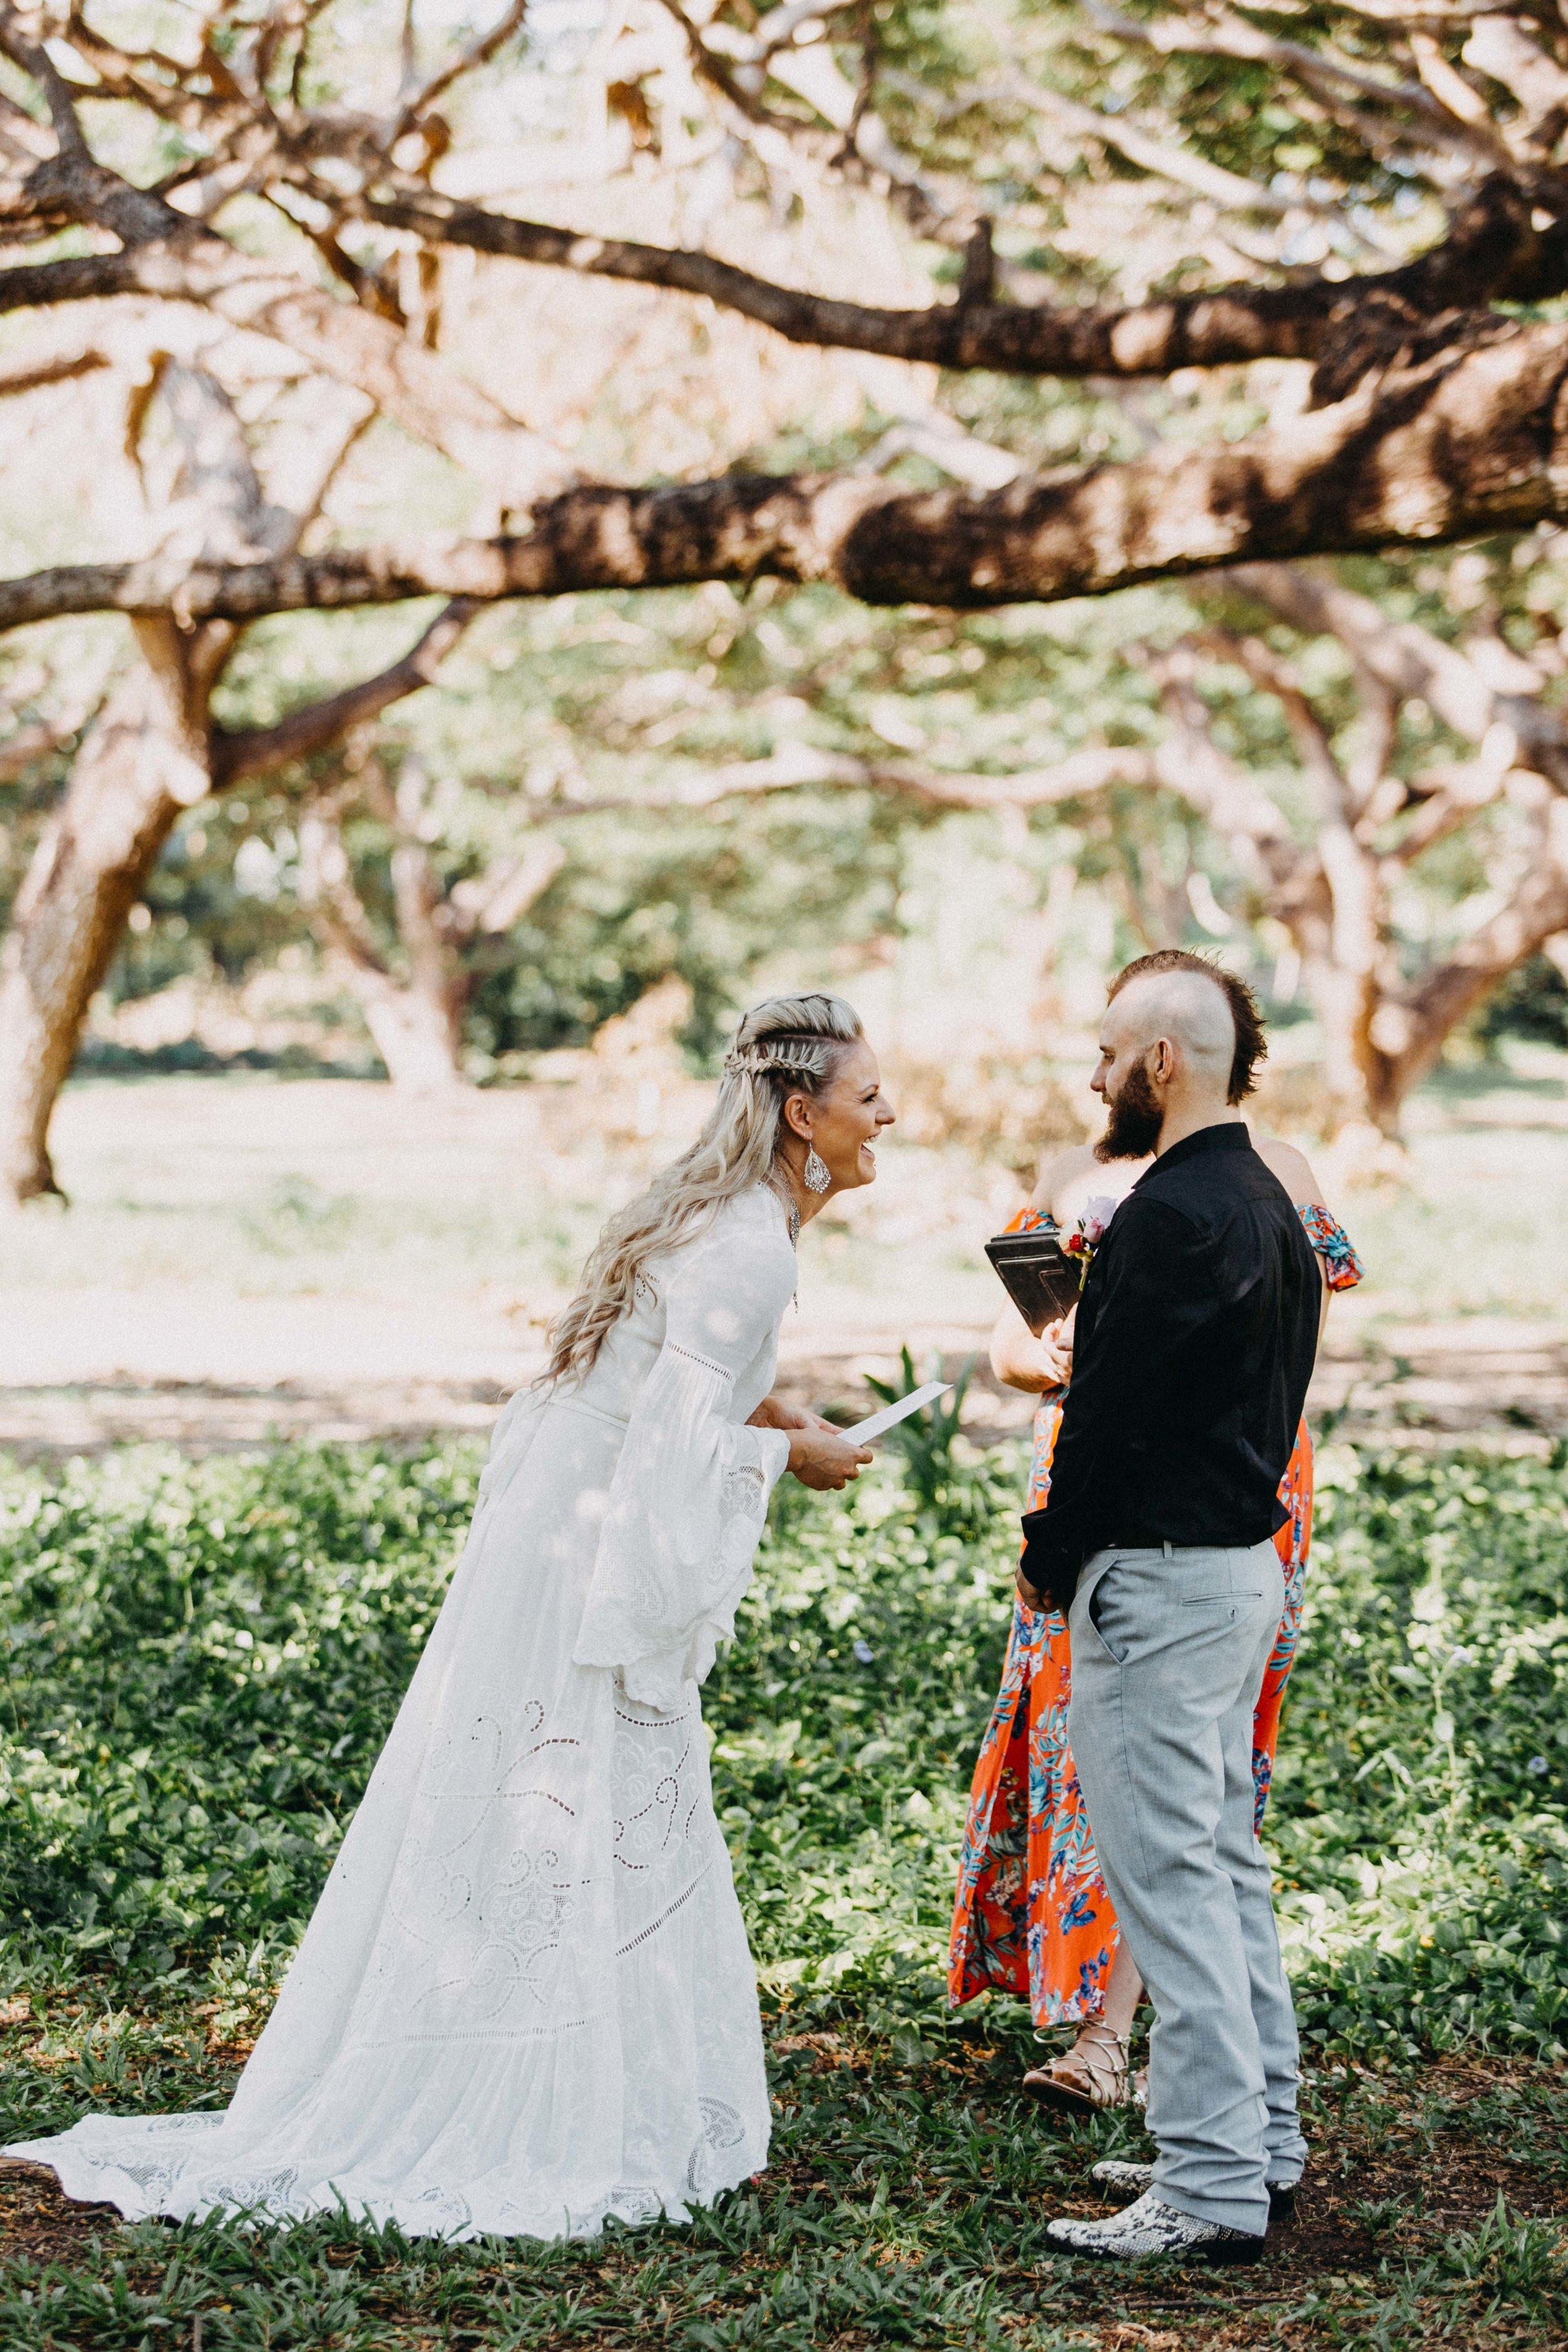 darwin-elopement-wedding-beach-camden-photography-www.emilyobrienphotography.net-20.jpg